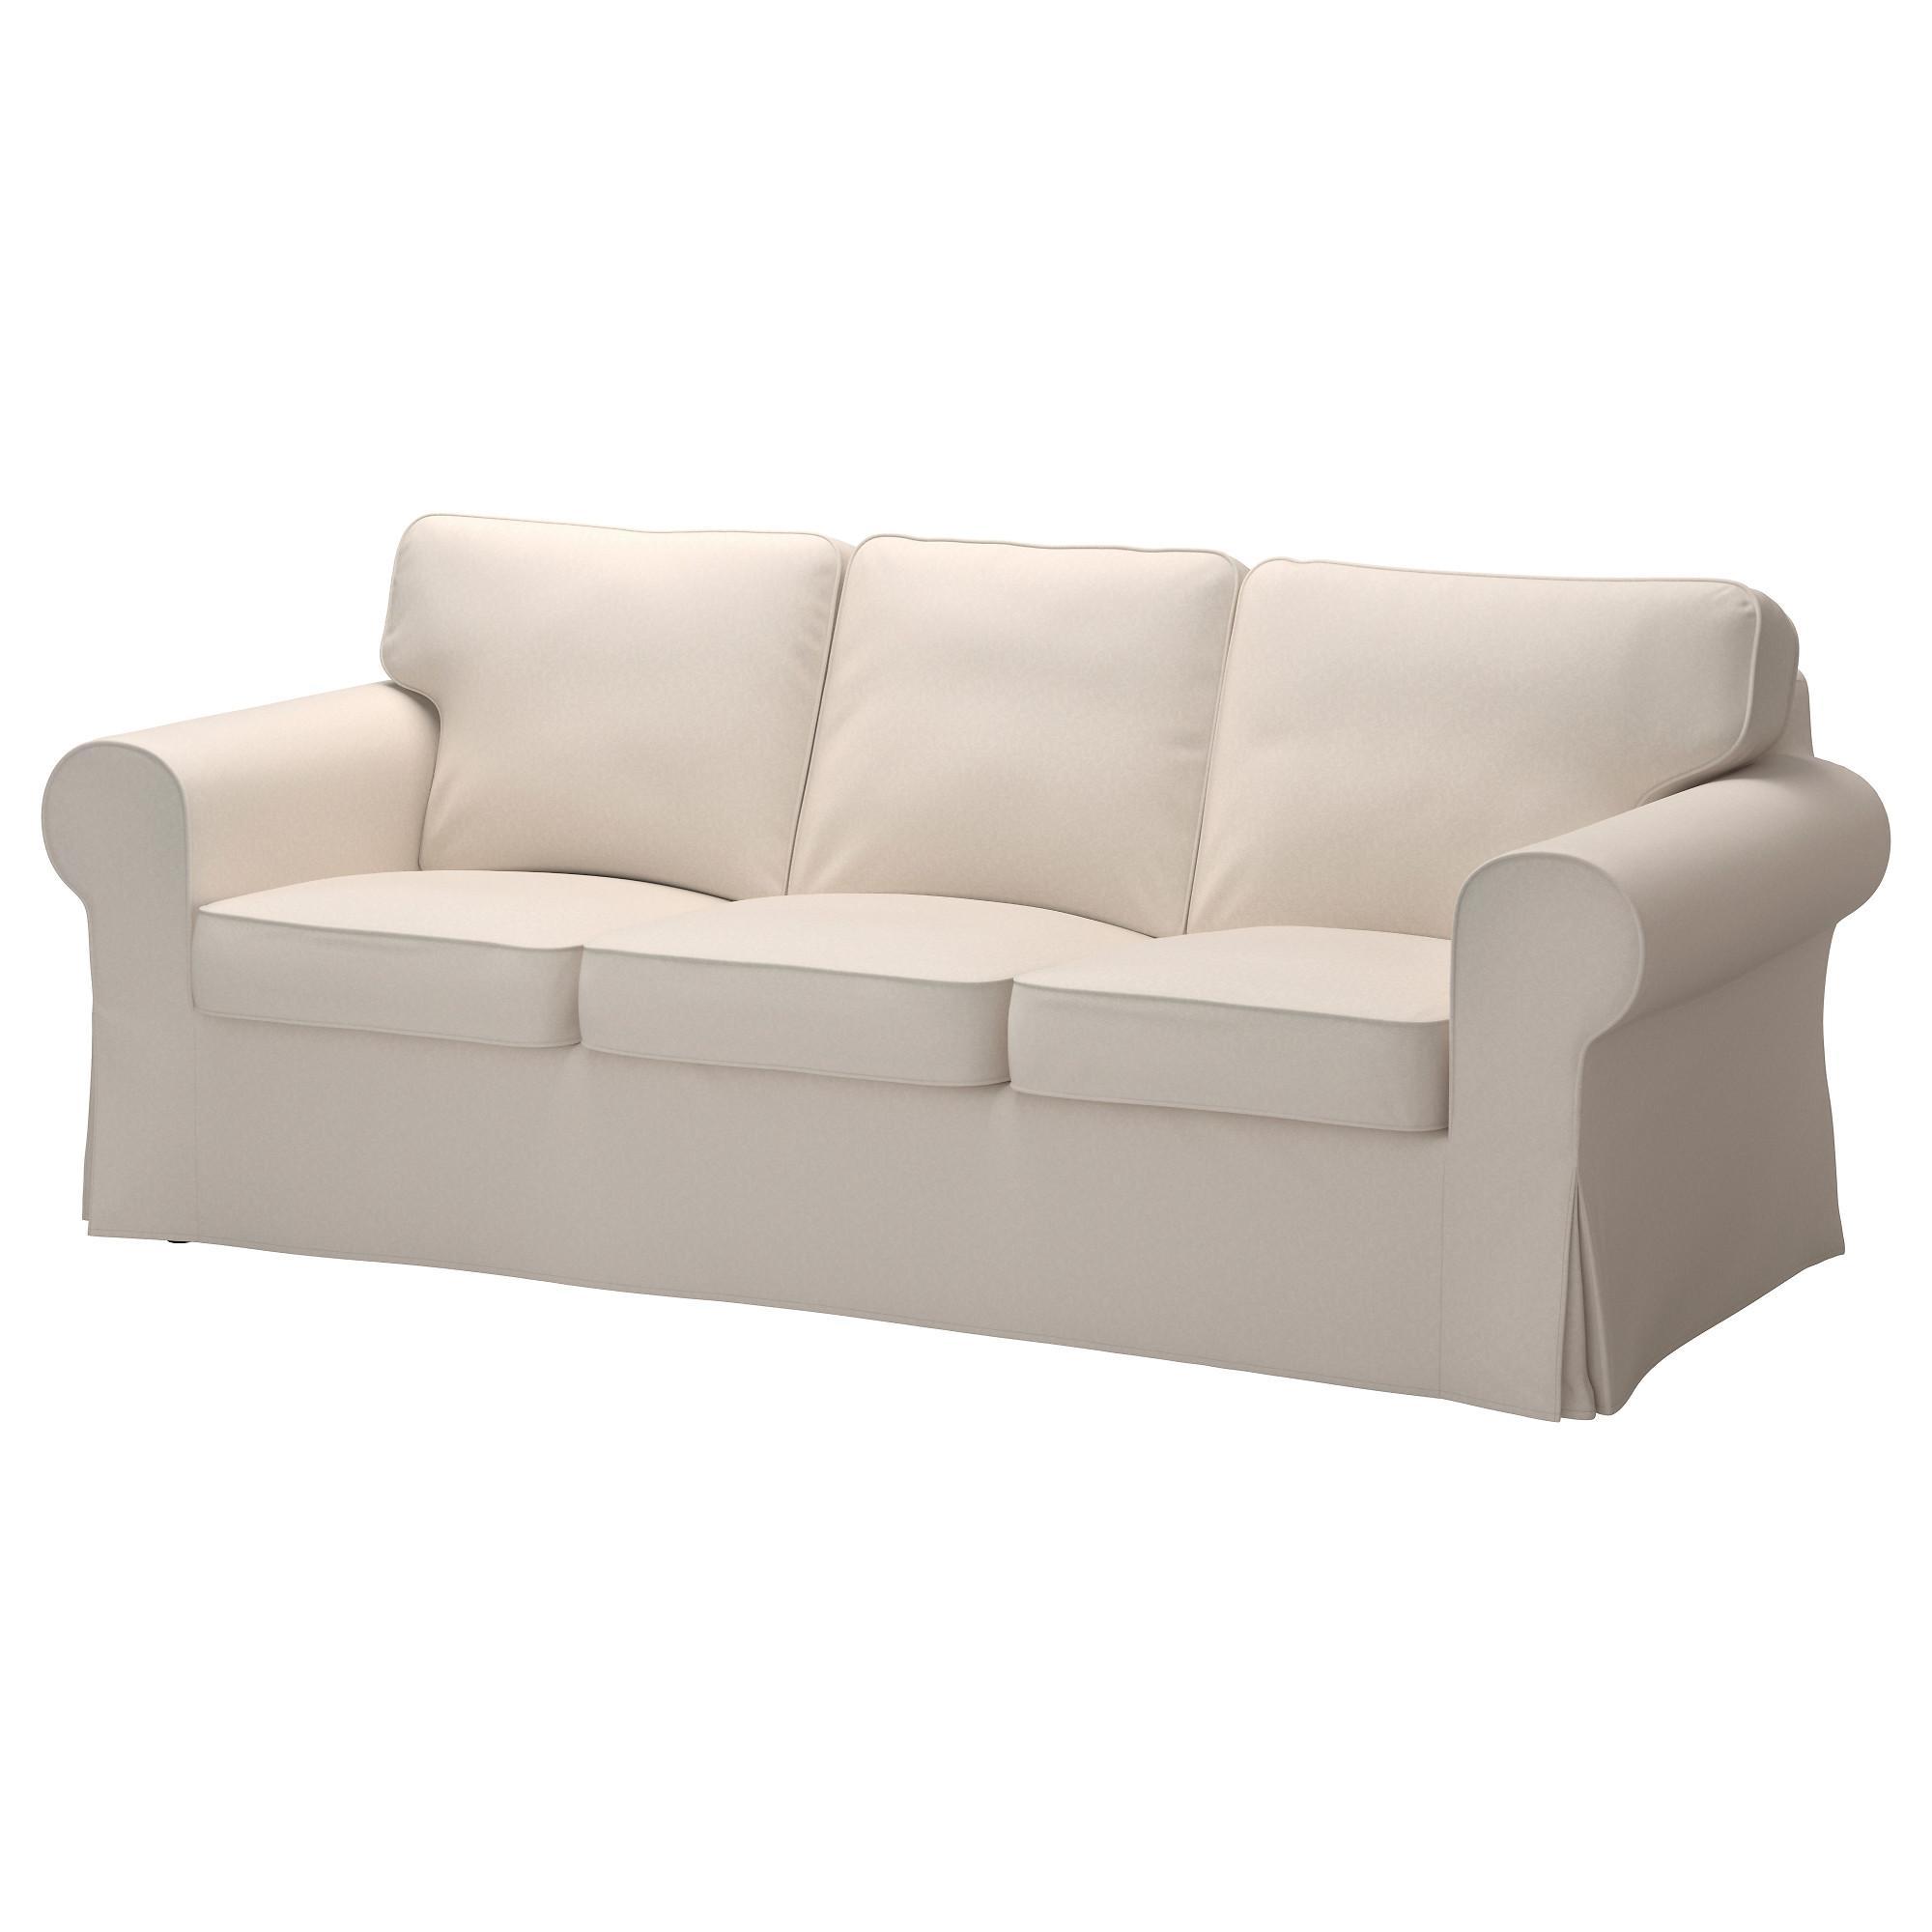 Fabric Sofas – Modern & Contemporary – Ikea Regarding Contemporary Fabric Sofas (View 8 of 20)